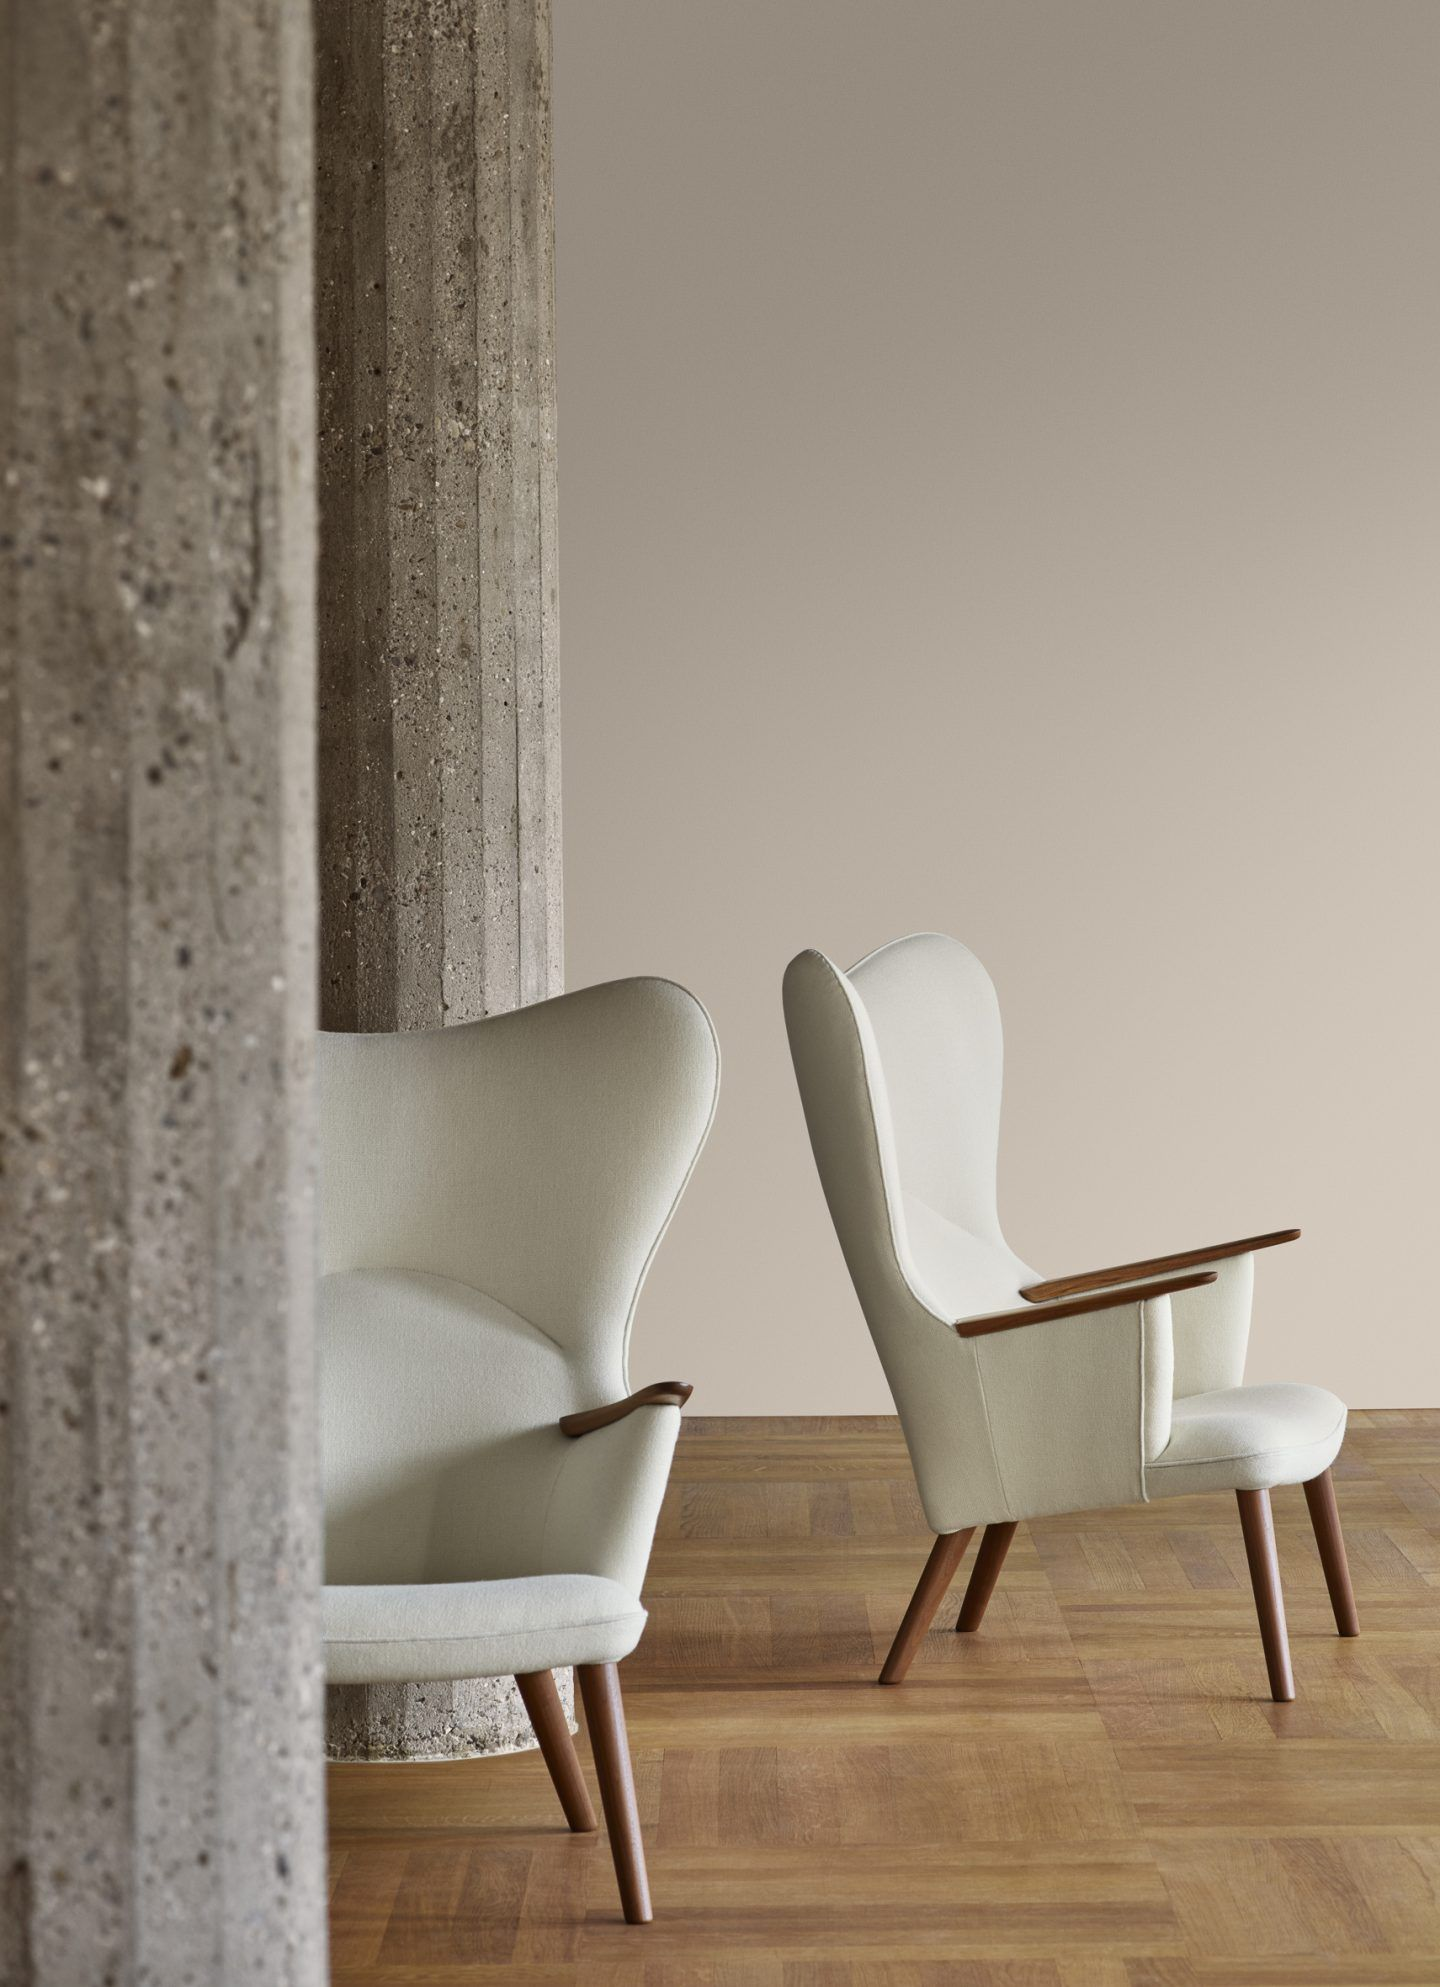 IGNANT-Design-Carl-Hansen-New-07